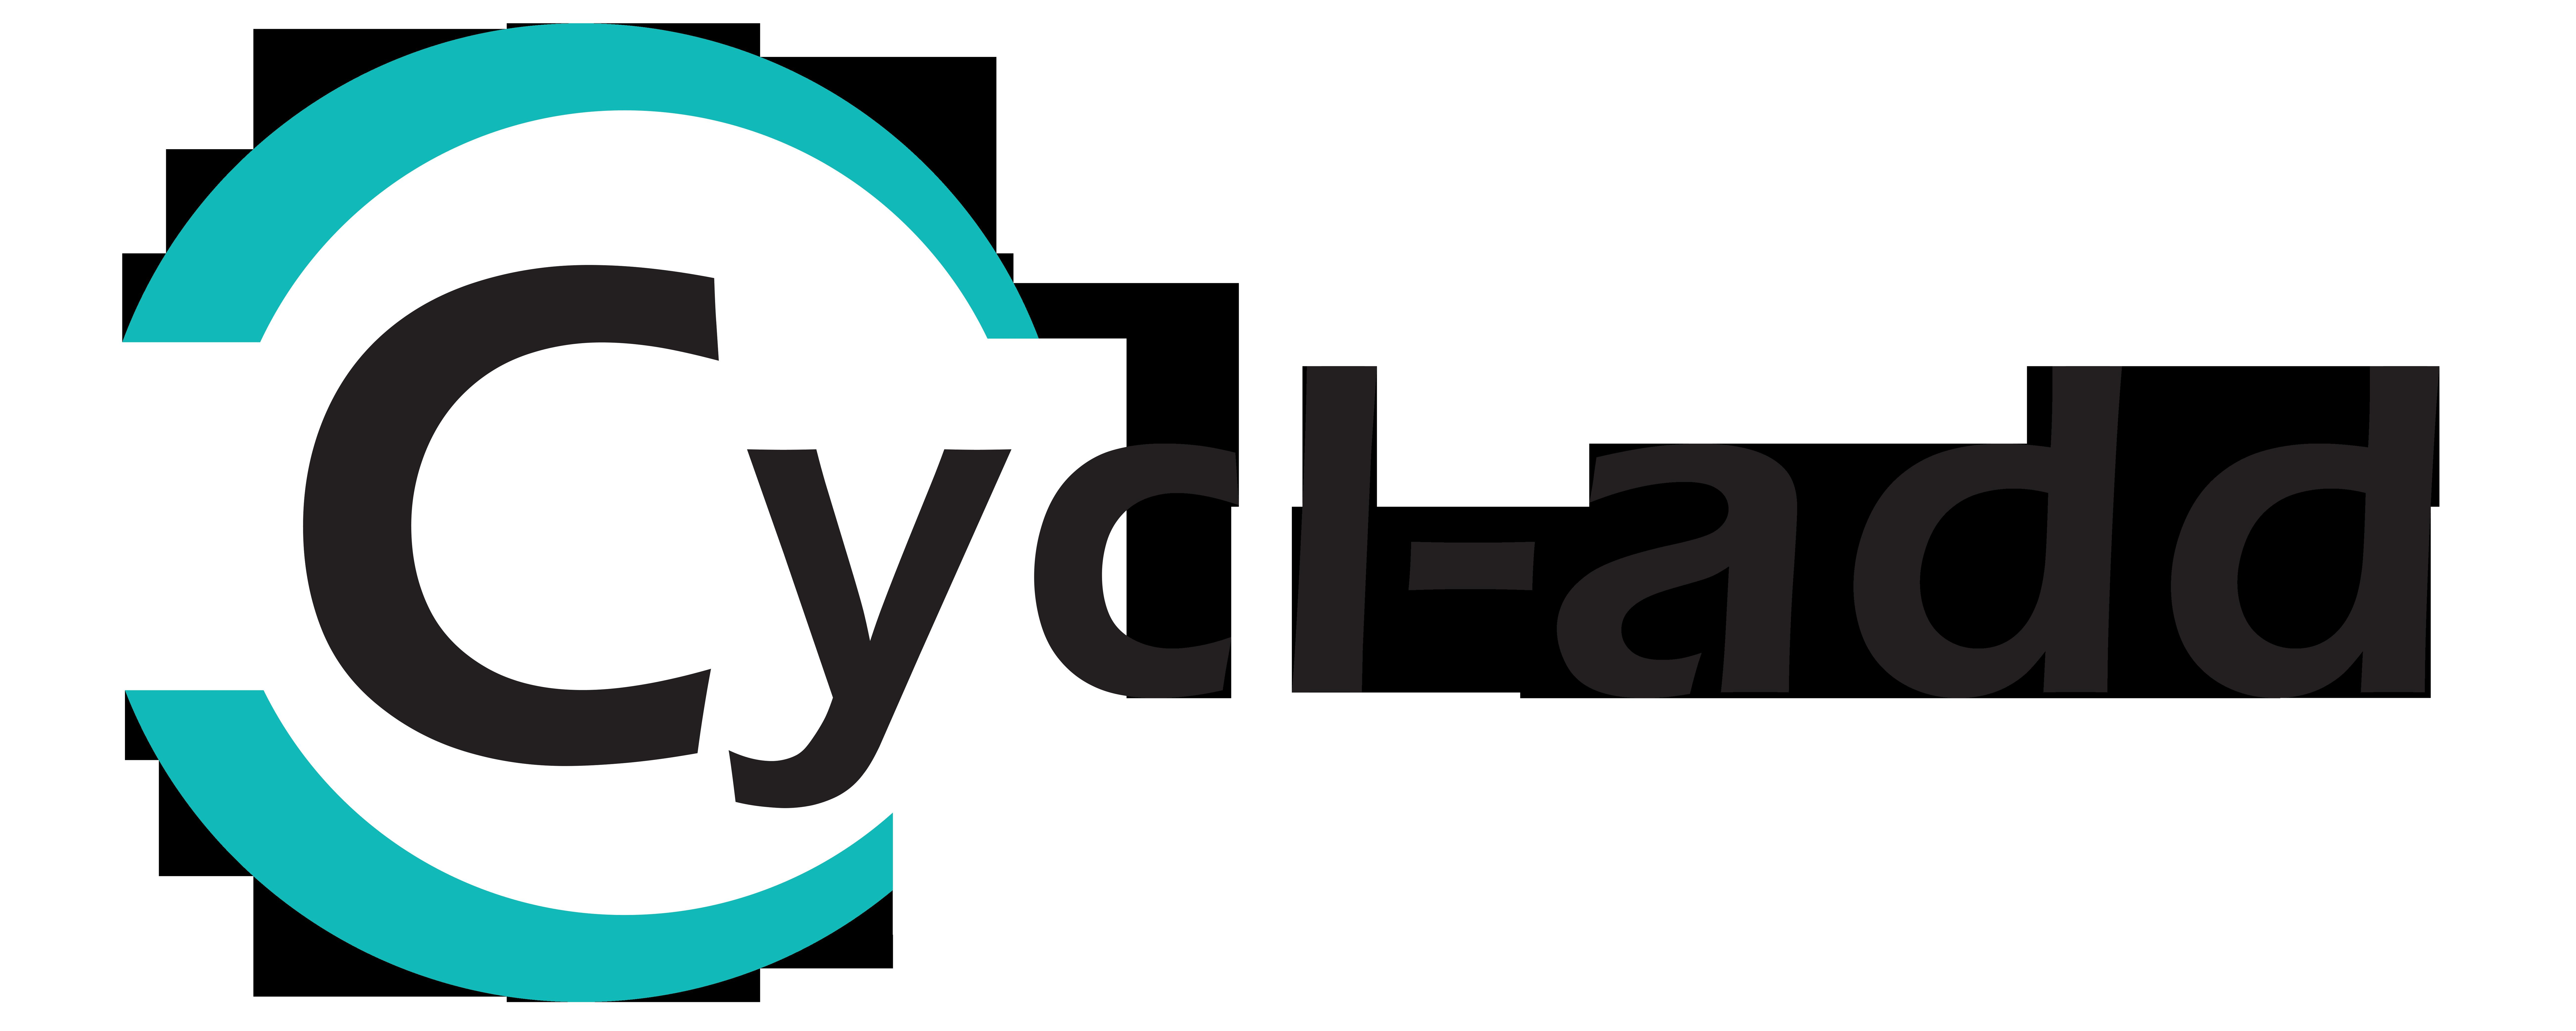 Cycl-add